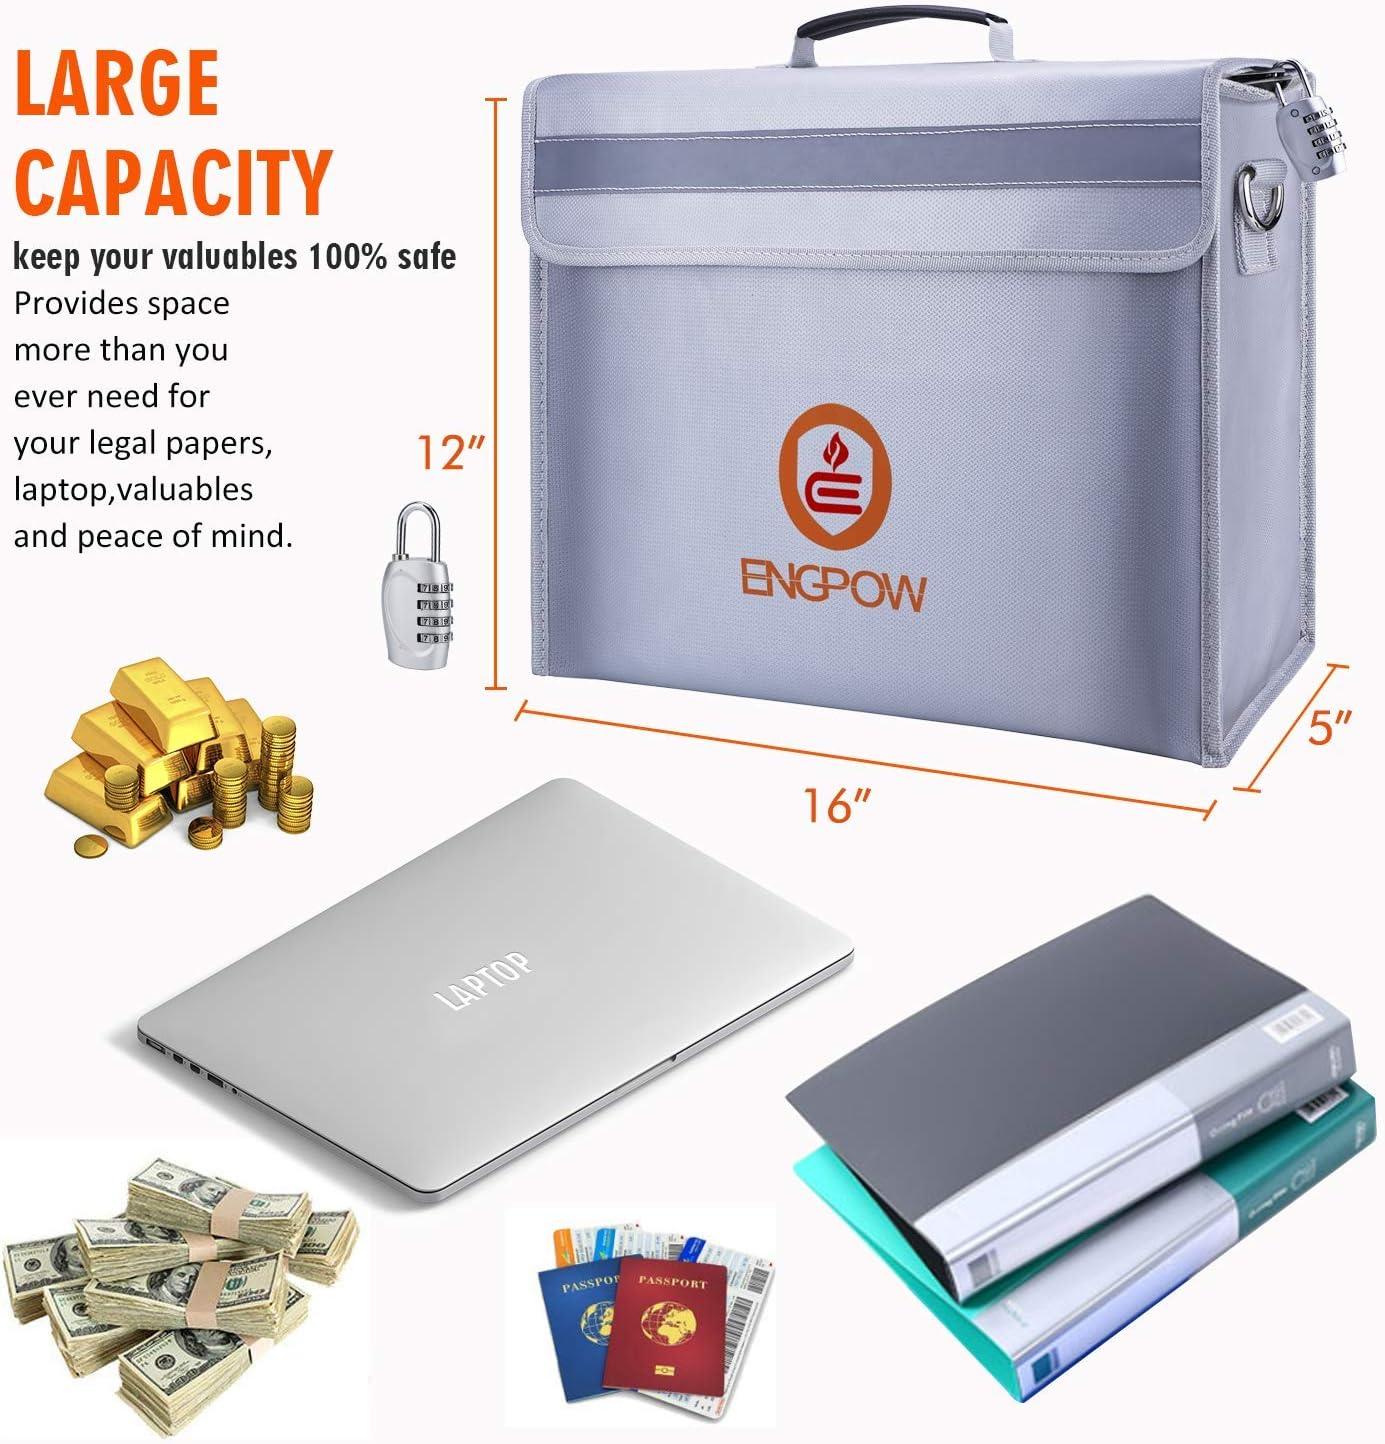 Fire Proof Tasche Cash Dokument Sicher Tasche Fire wasserabweisend Material 23/x 30/cm